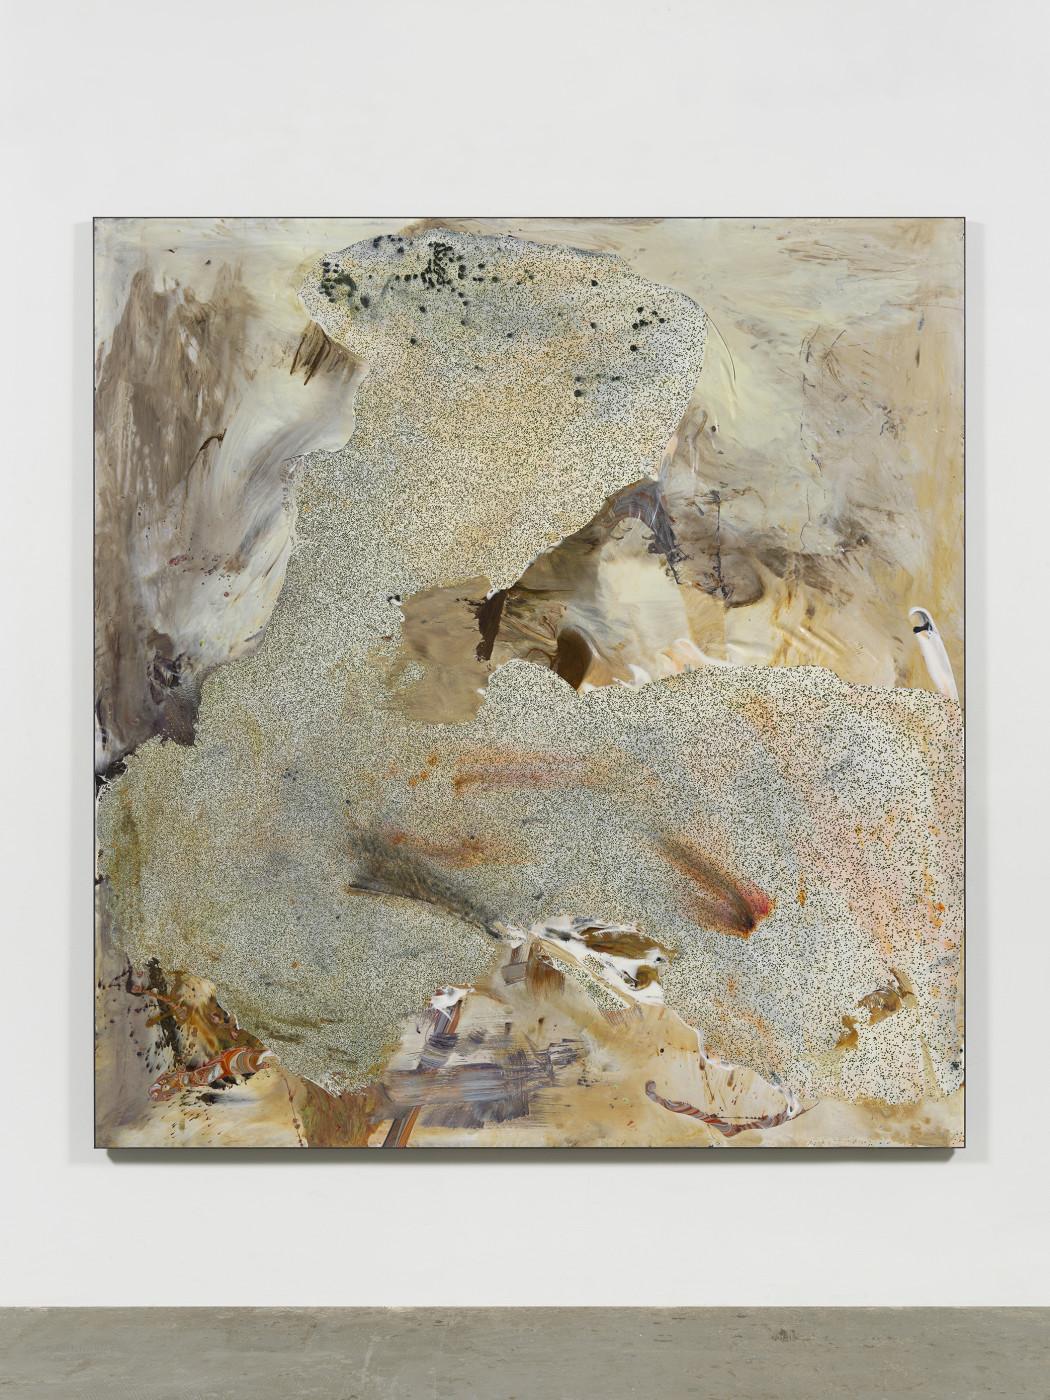 <p><i>White Painting</i></p><p>2019</p><p>cast urethane resin, fiberglass, epoxy</p><p>72 x 67 in</p>